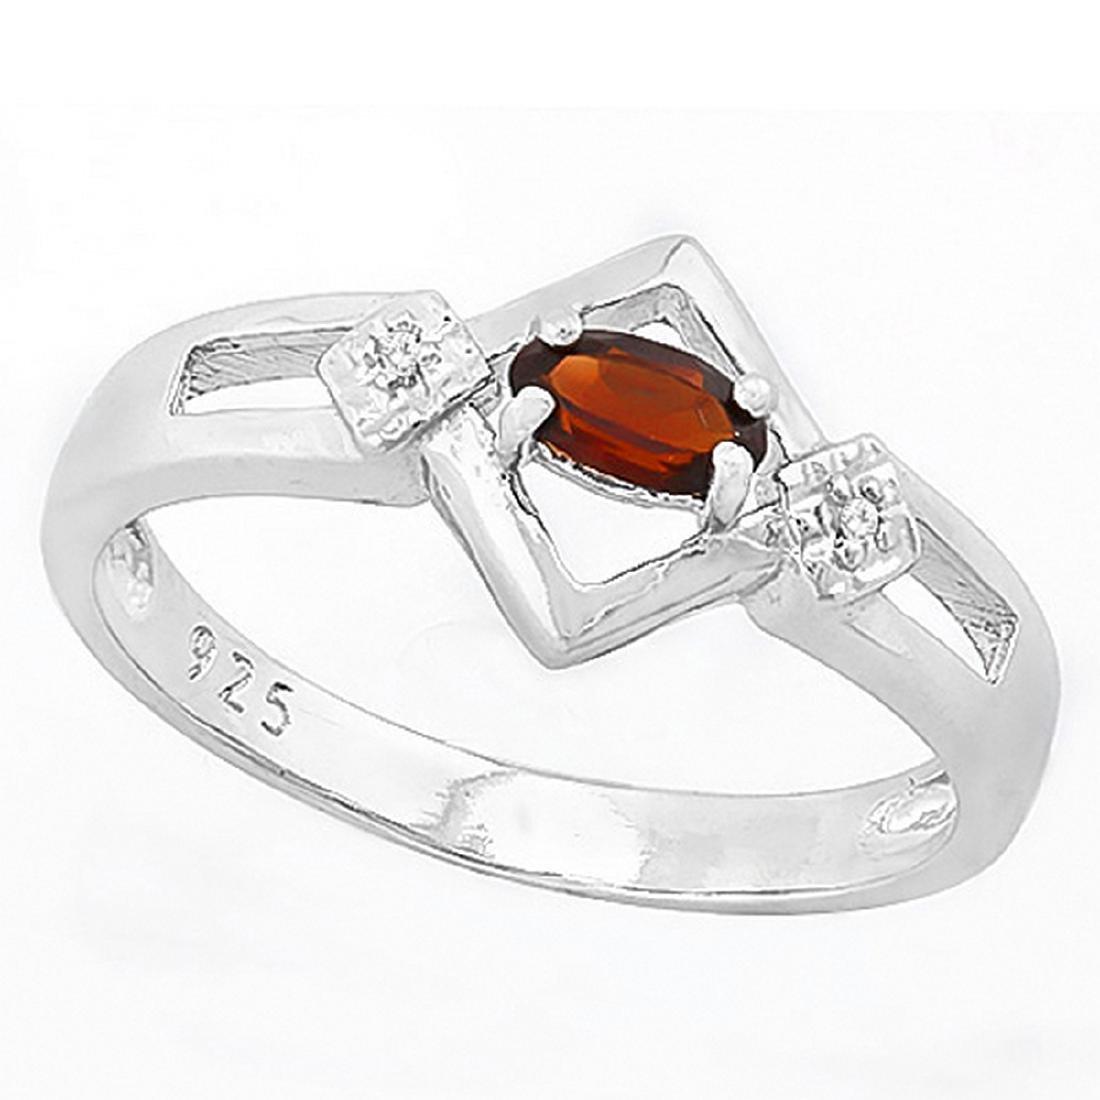 Art Deco Inspired Garnet and Diamond Ring in Sterling